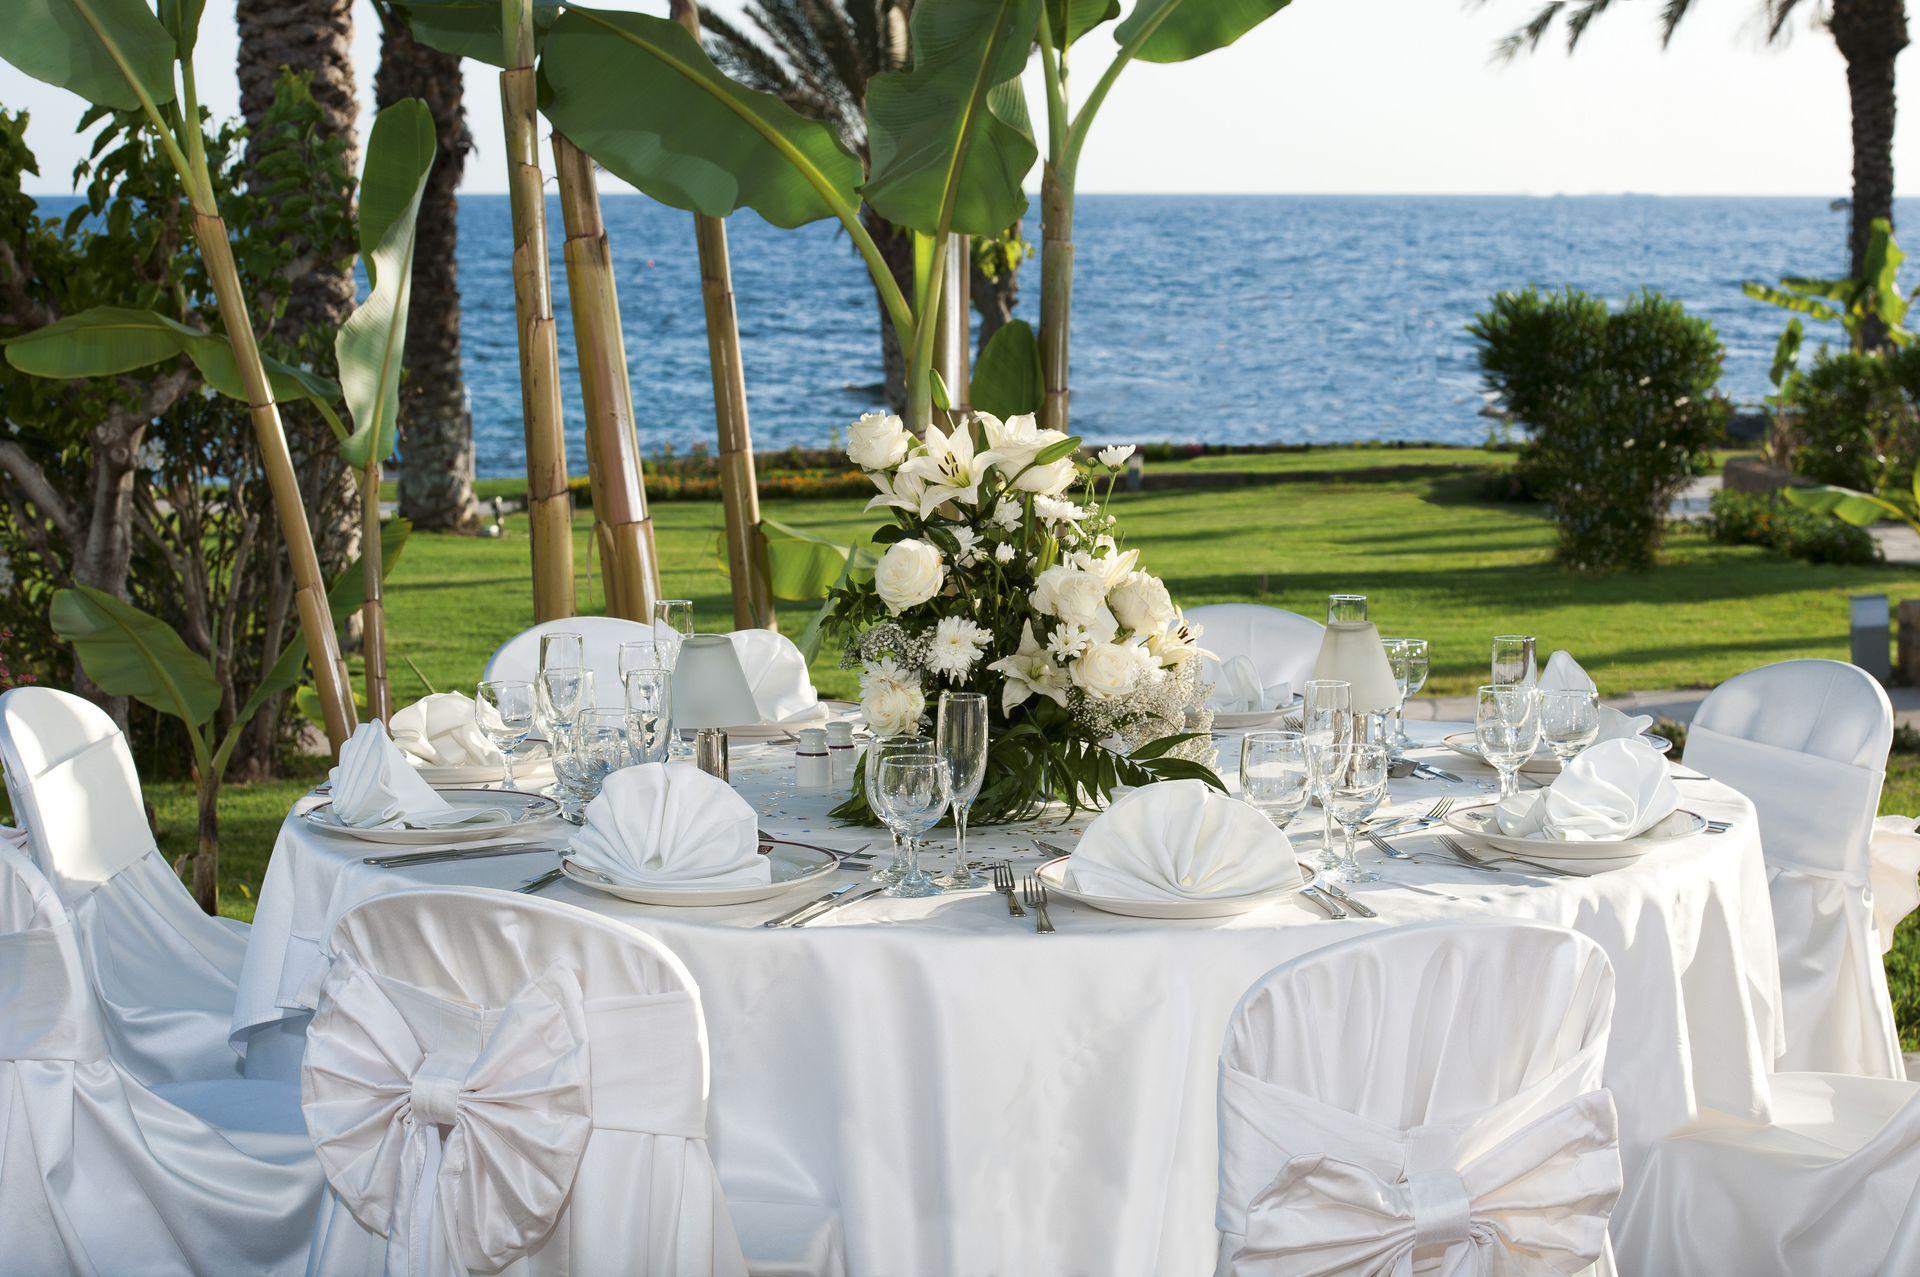 _athena beach hotel - weddings 2_resized